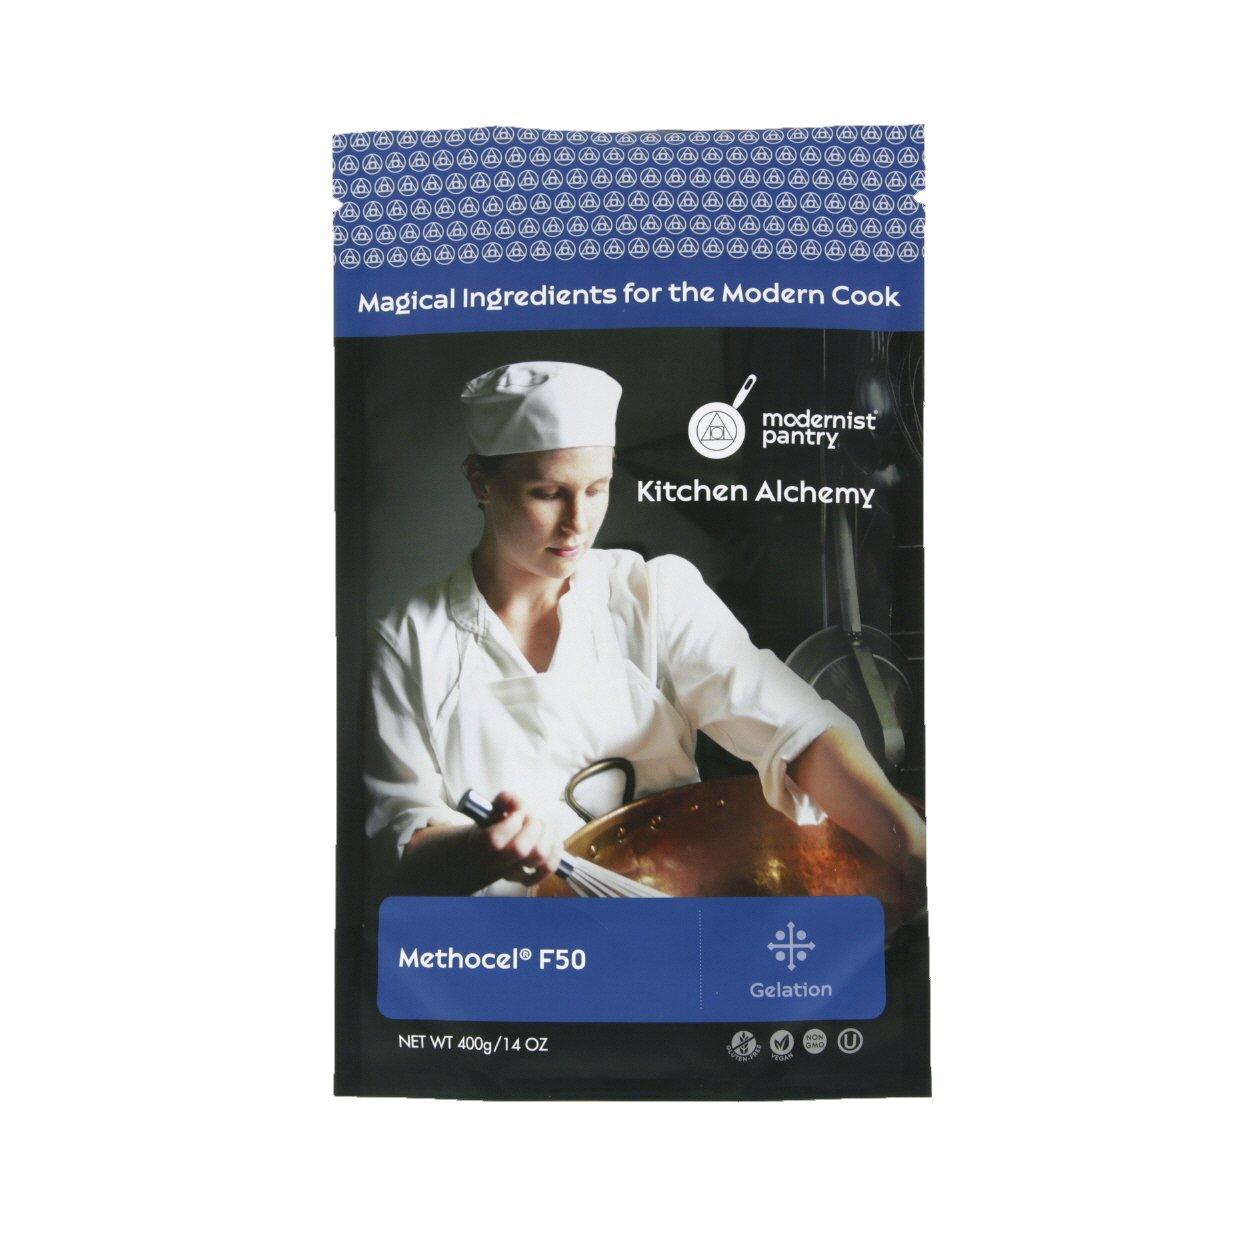 Hydroxypropyl Methylcellulose - Methocel F50 ⊘ Non-GMO ☮ Vegan ✡ OU Kosher Certified - 400g/14oz